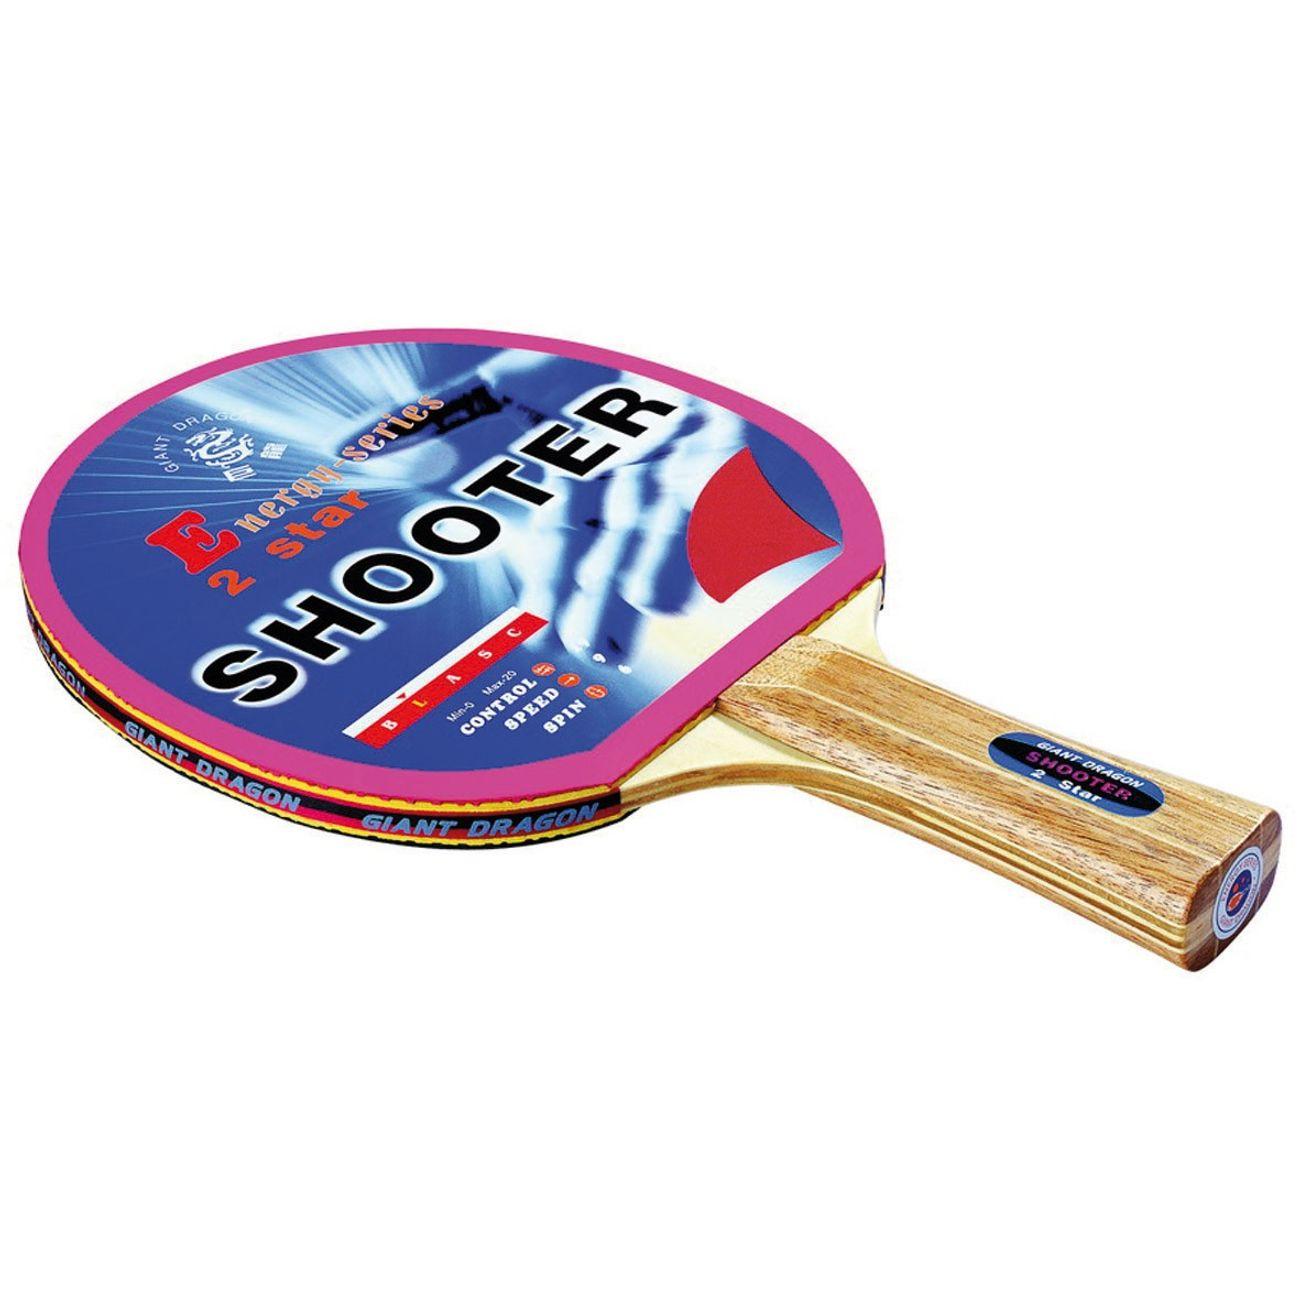 Tennis de table  Sporti France Raquette de ping-pong Shooter Sportifrance